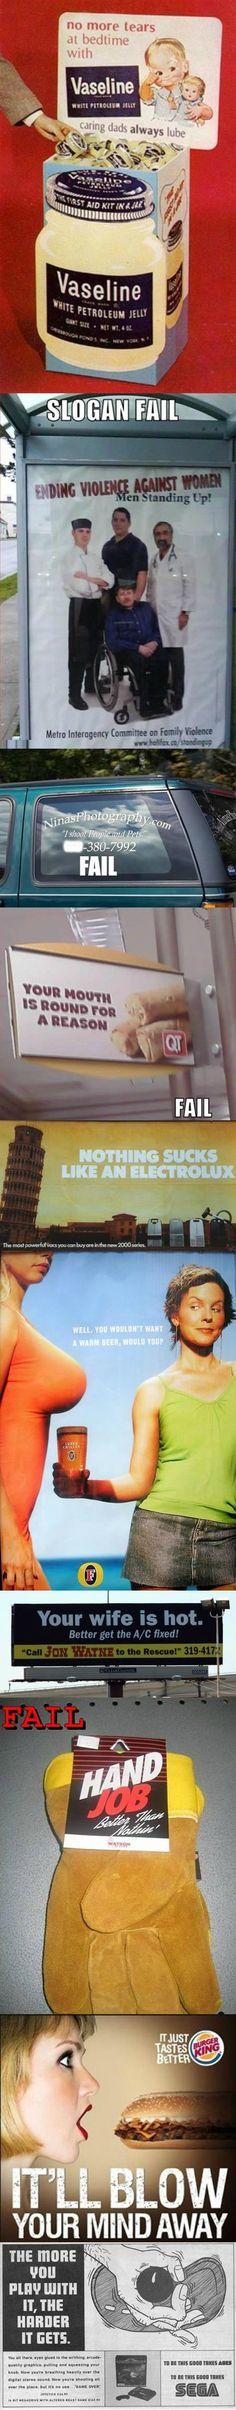 Advertising Fails